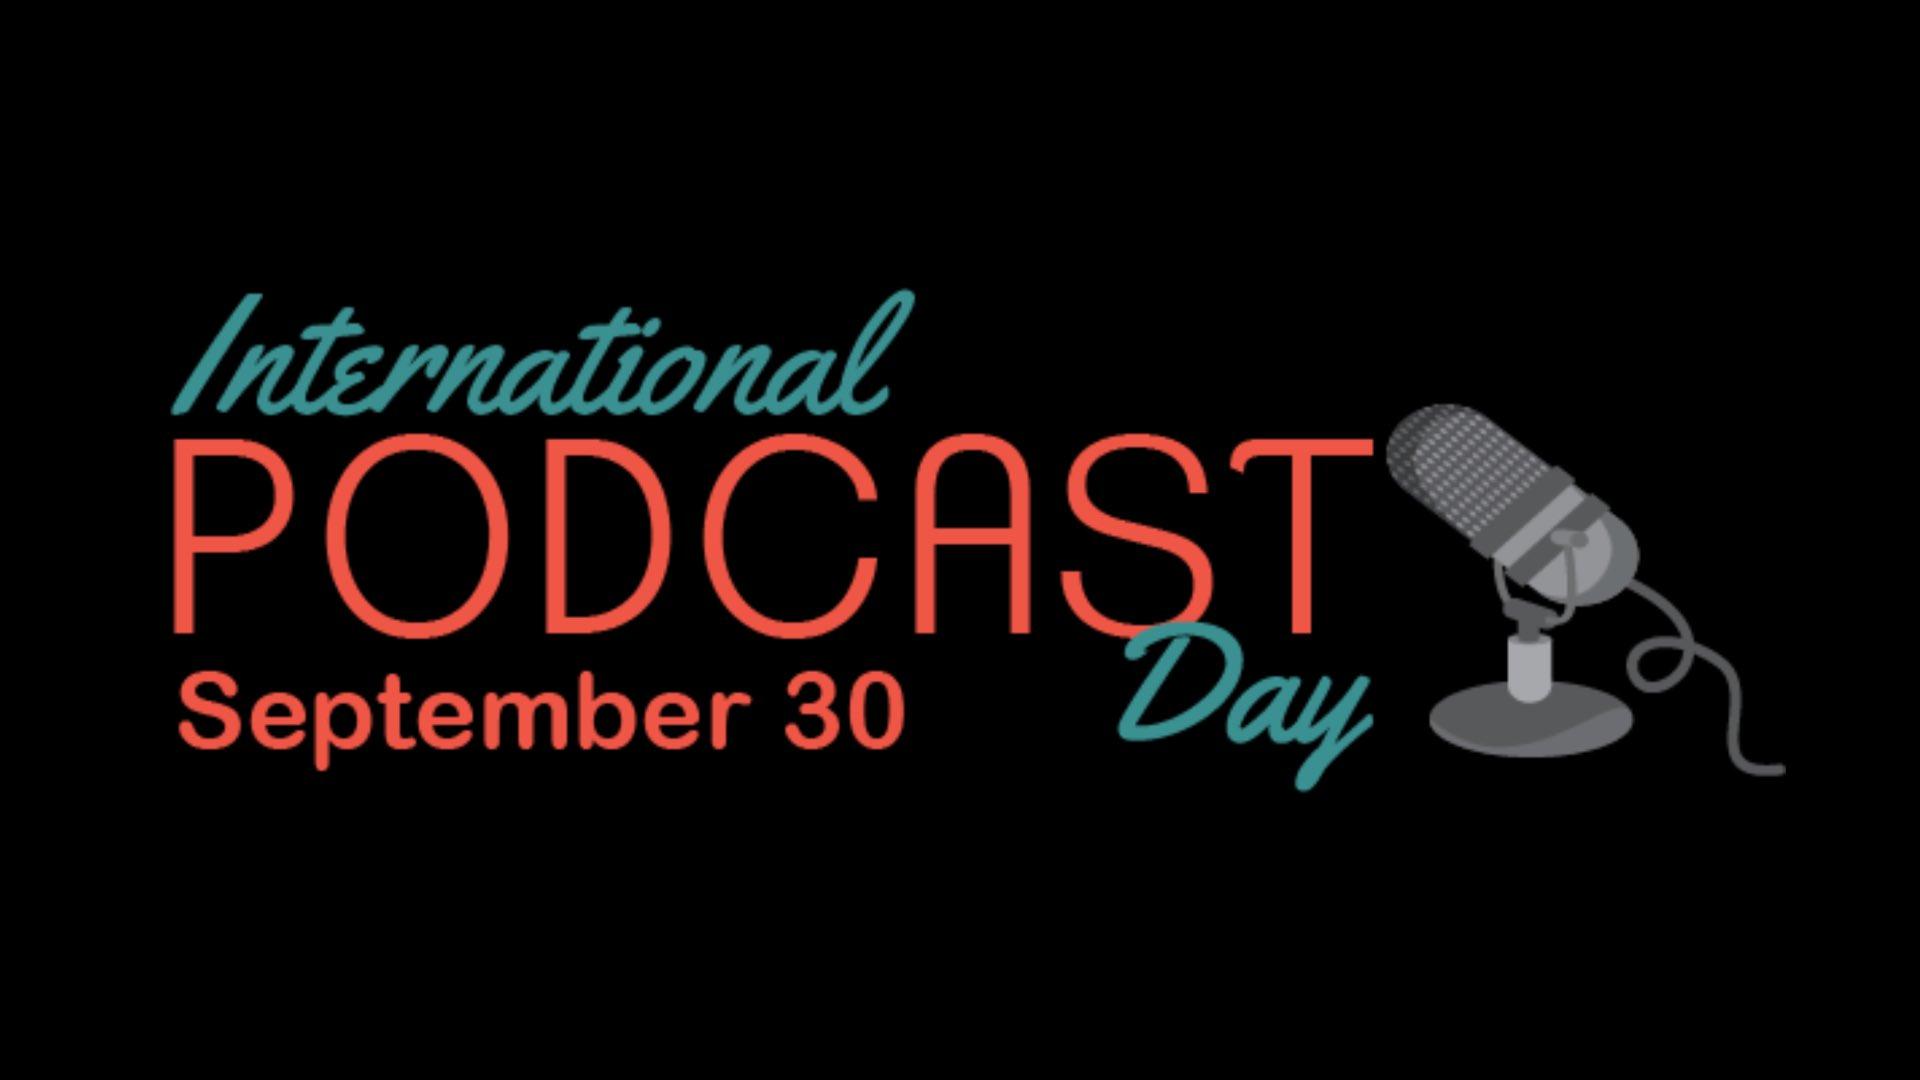 international podcast day poster